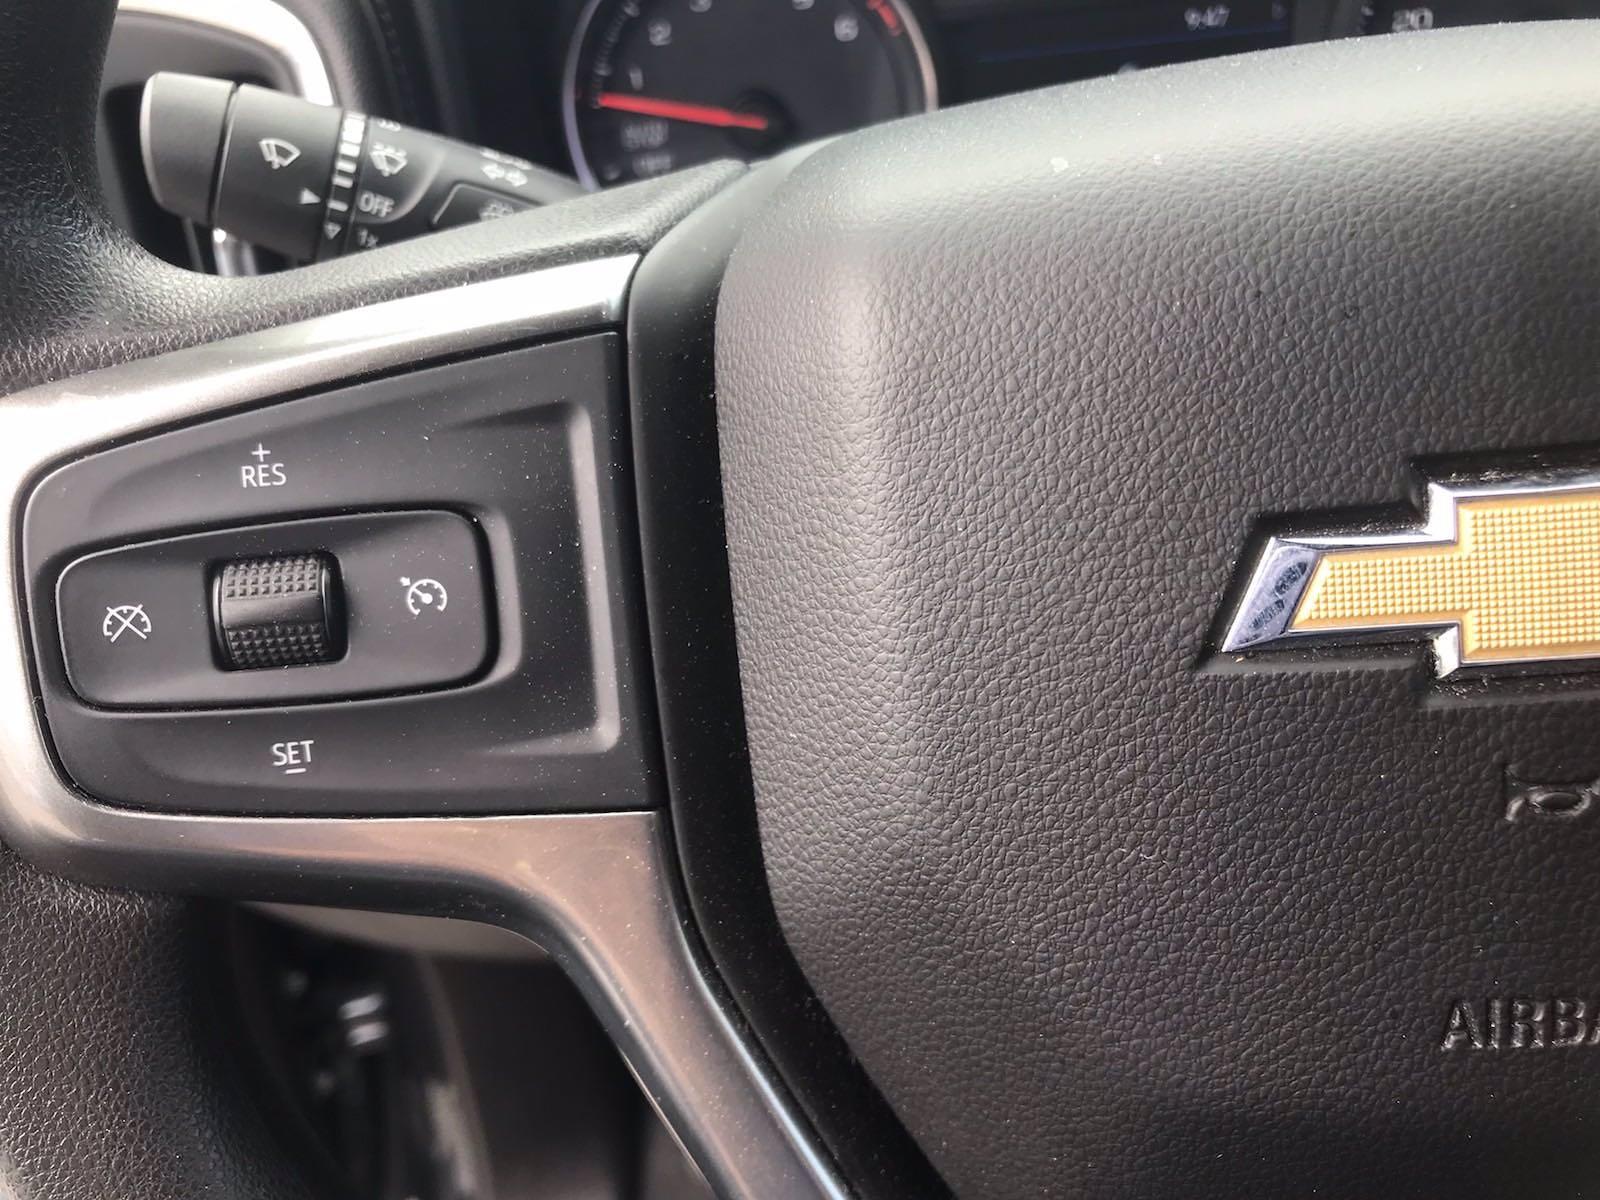 2020 Chevrolet Silverado 1500 Crew Cab 4x4, Pickup #16476PN - photo 26